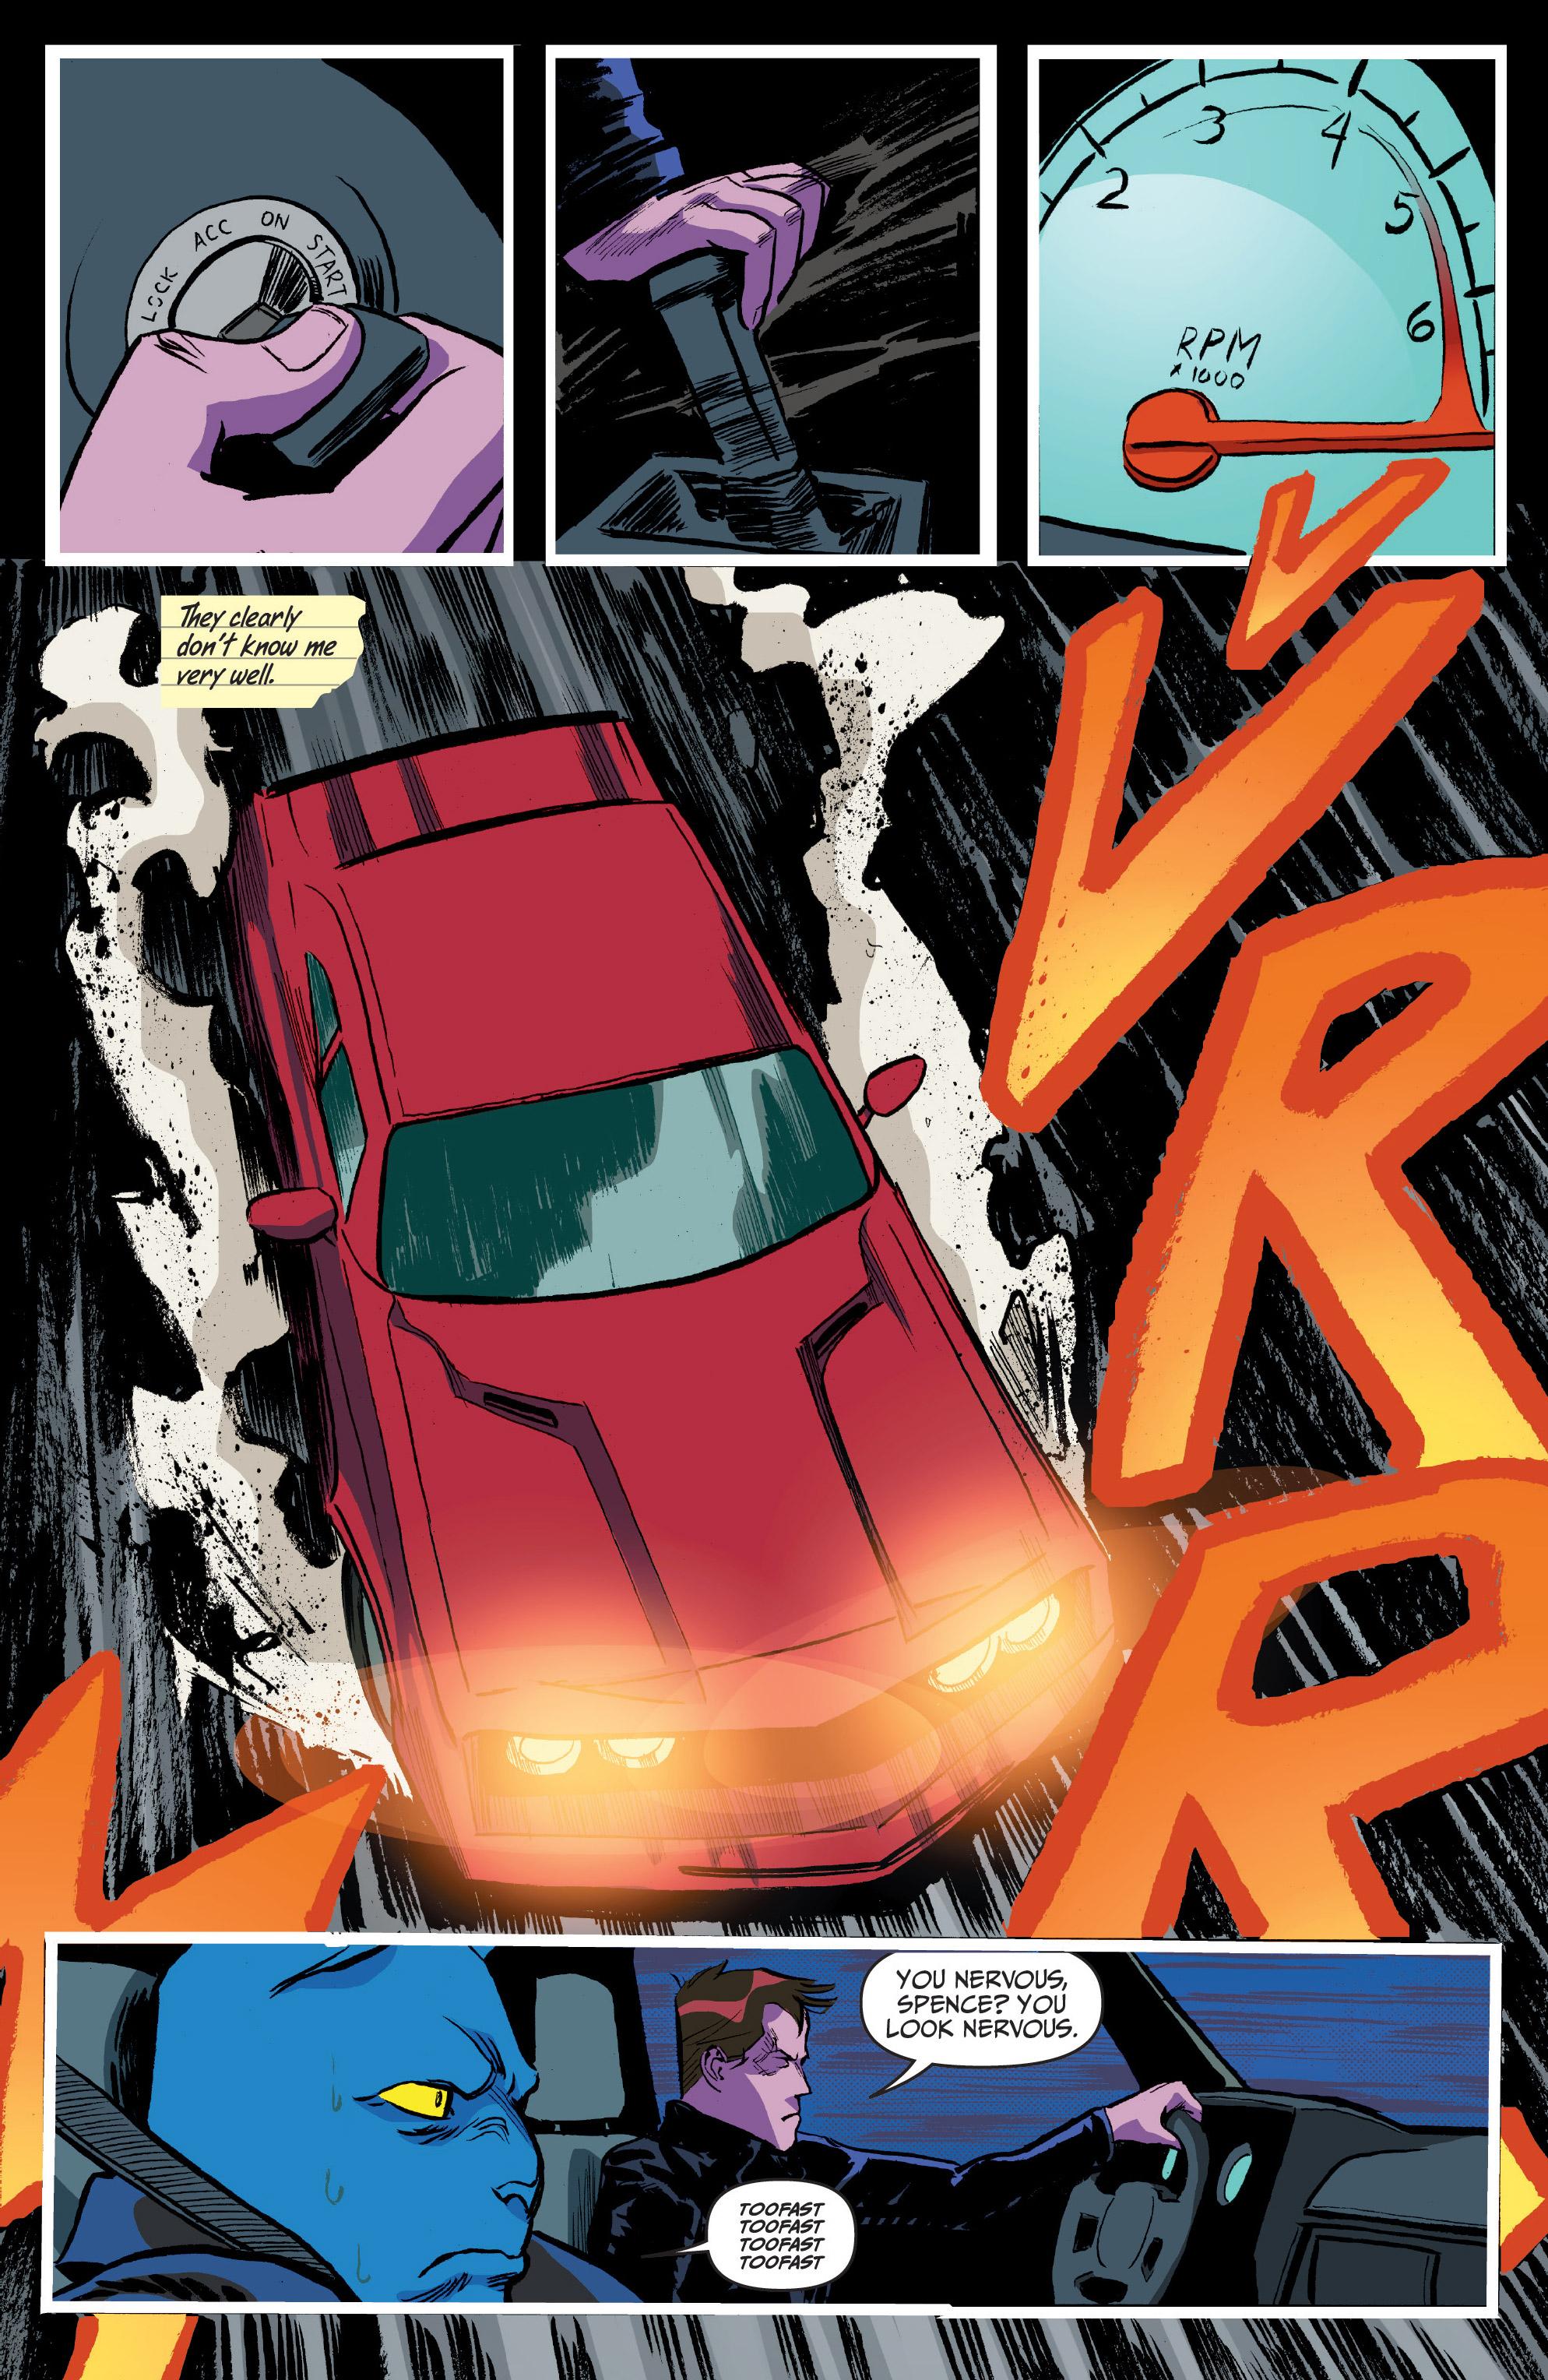 Read online Spencer & Locke comic -  Issue #2 - 16